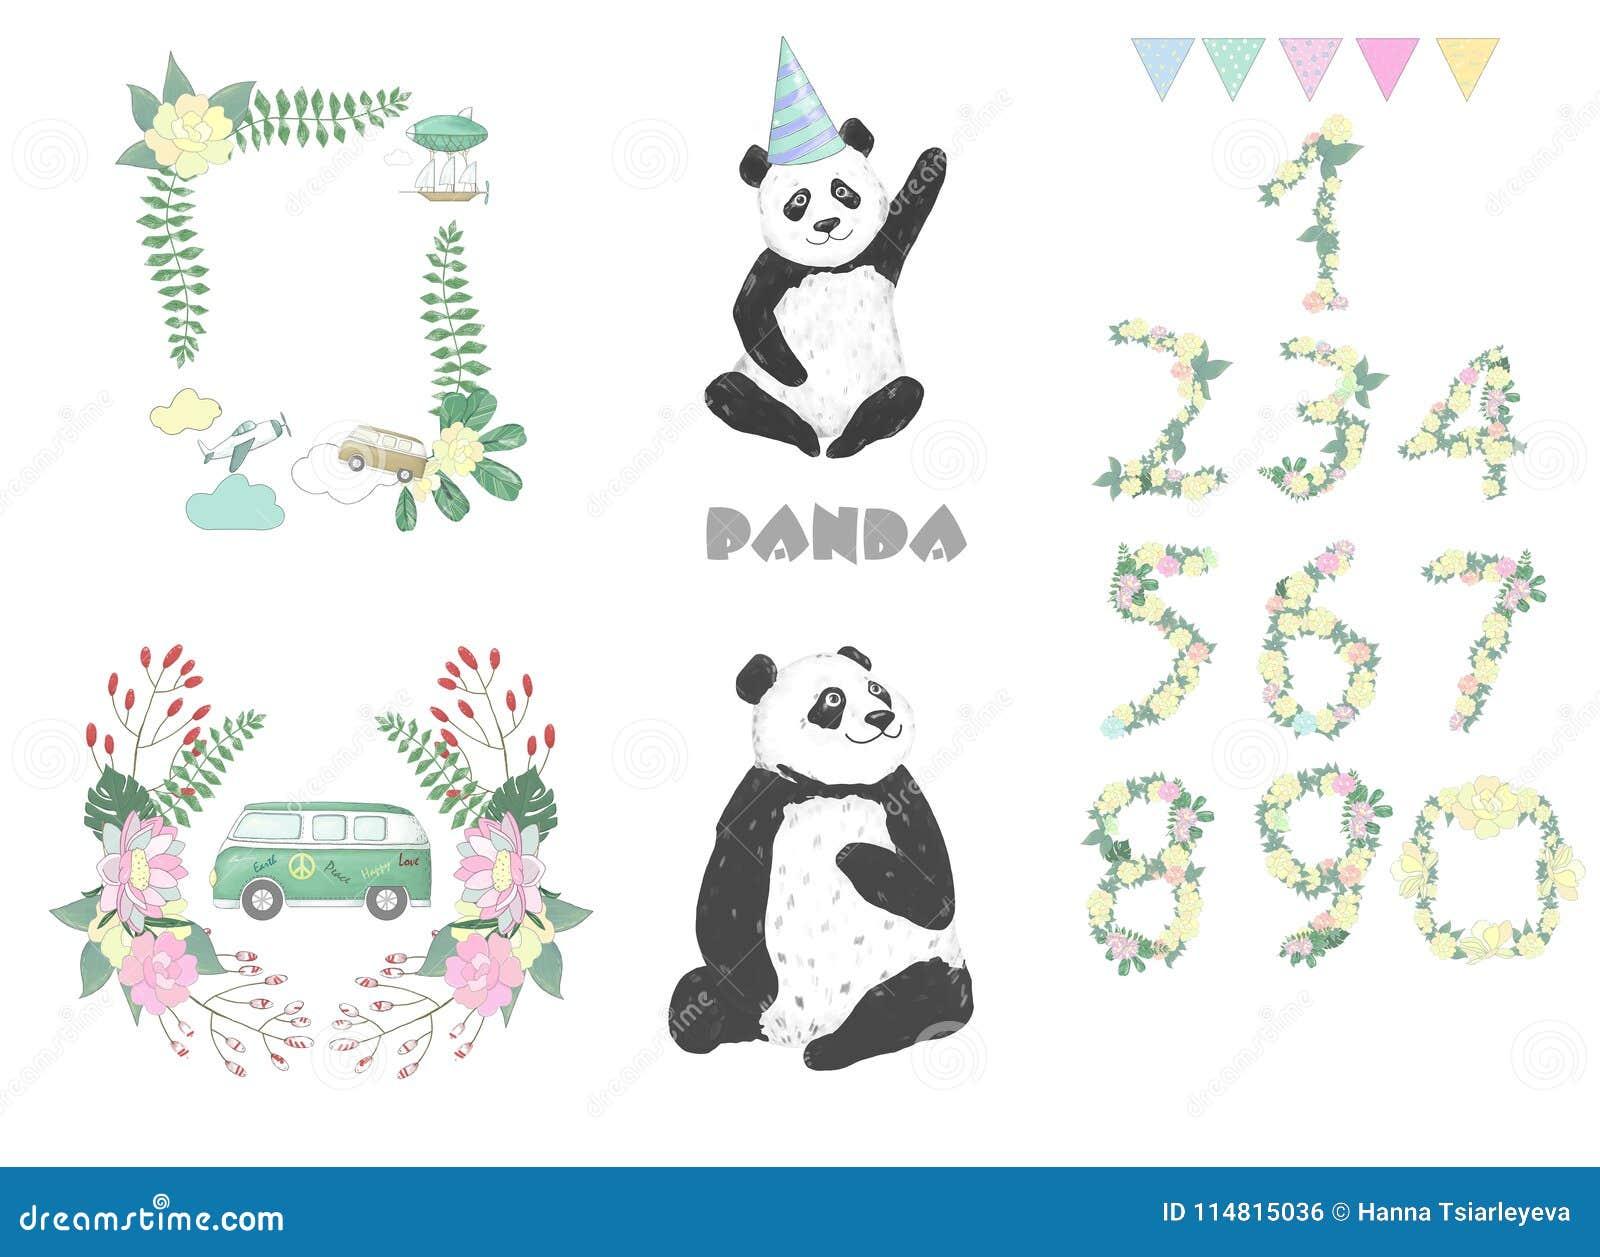 Panda Clip Art Drawing Animal Illustration On White Background Cute Animal Celebration Card Stock Illustration Illustration Of Image Cartoon 114815036